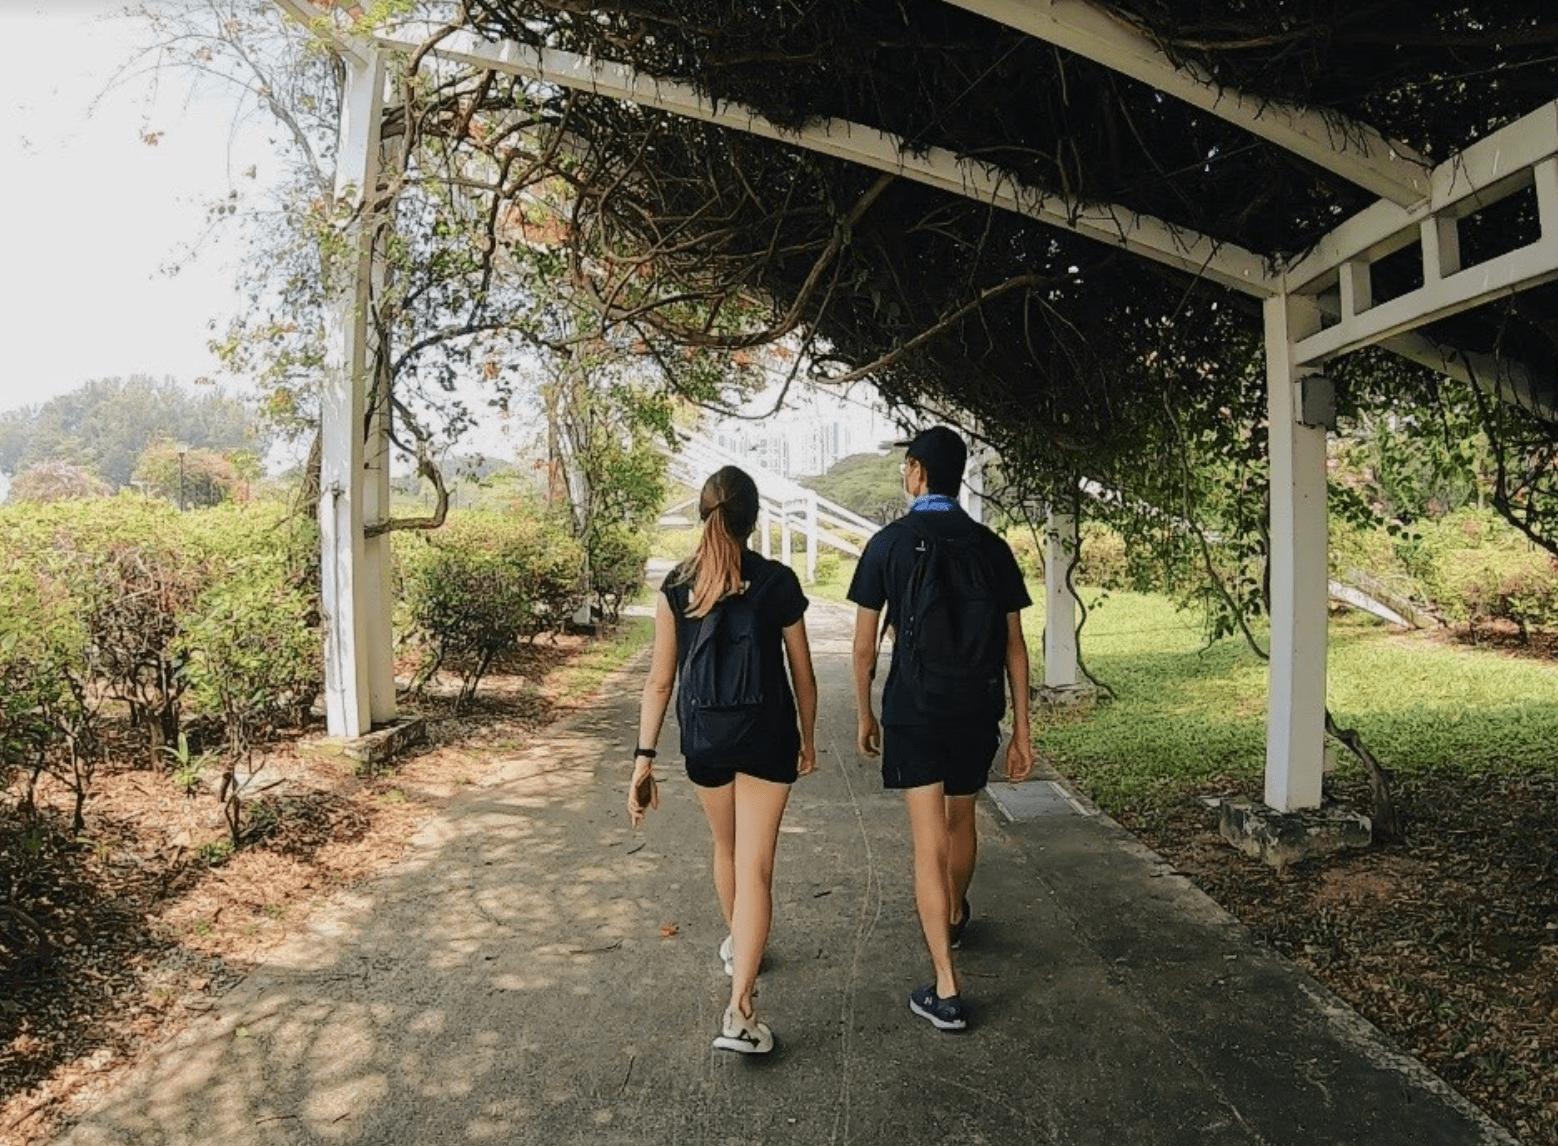 150km singapore walking trail